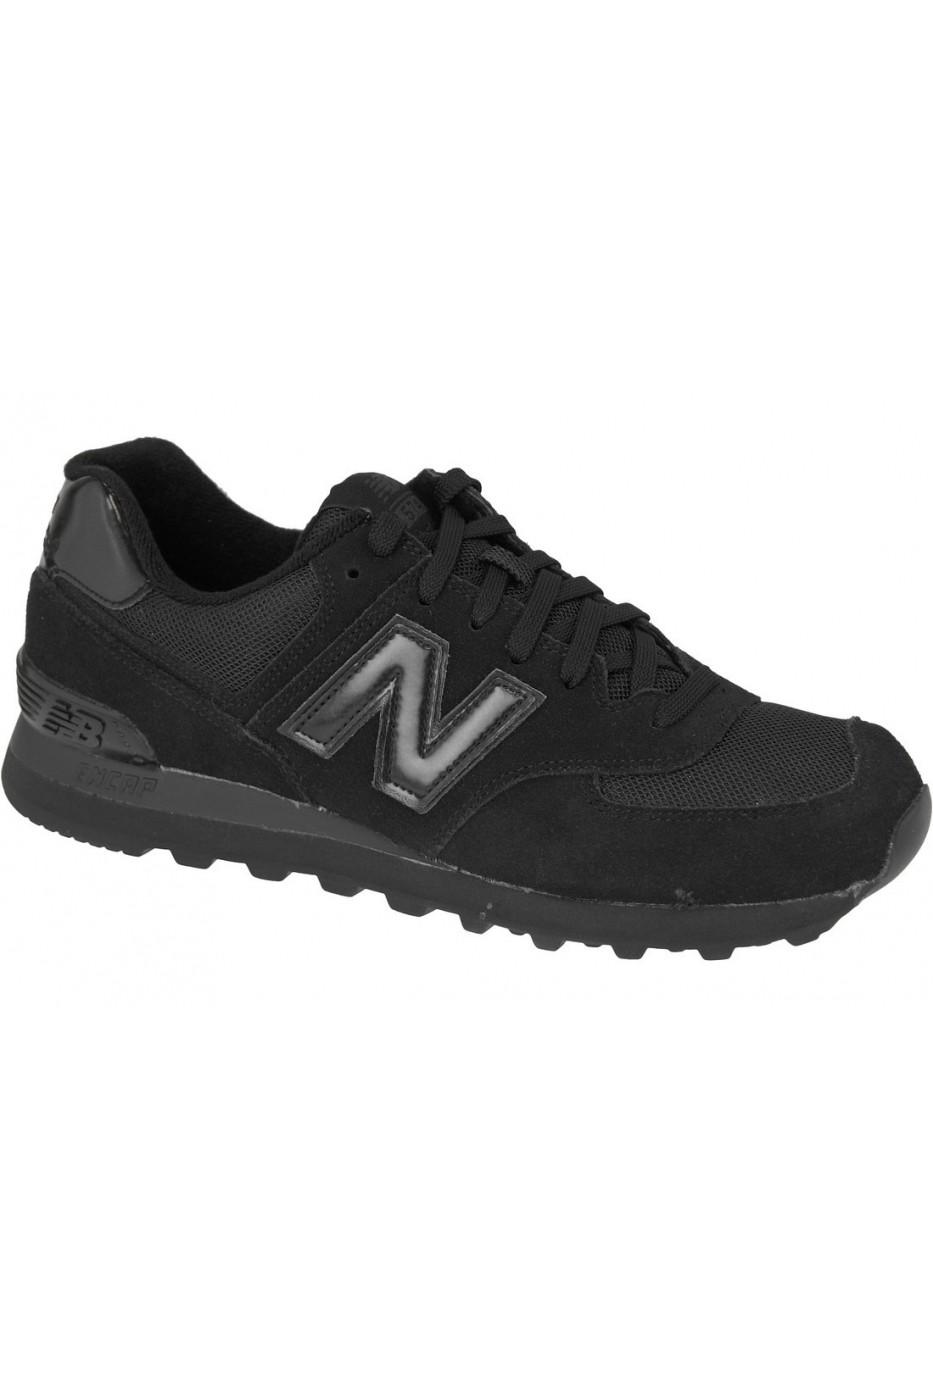 newest d72ef 8e263 Pantofi sport New Balance M574TBK - FashionUP!